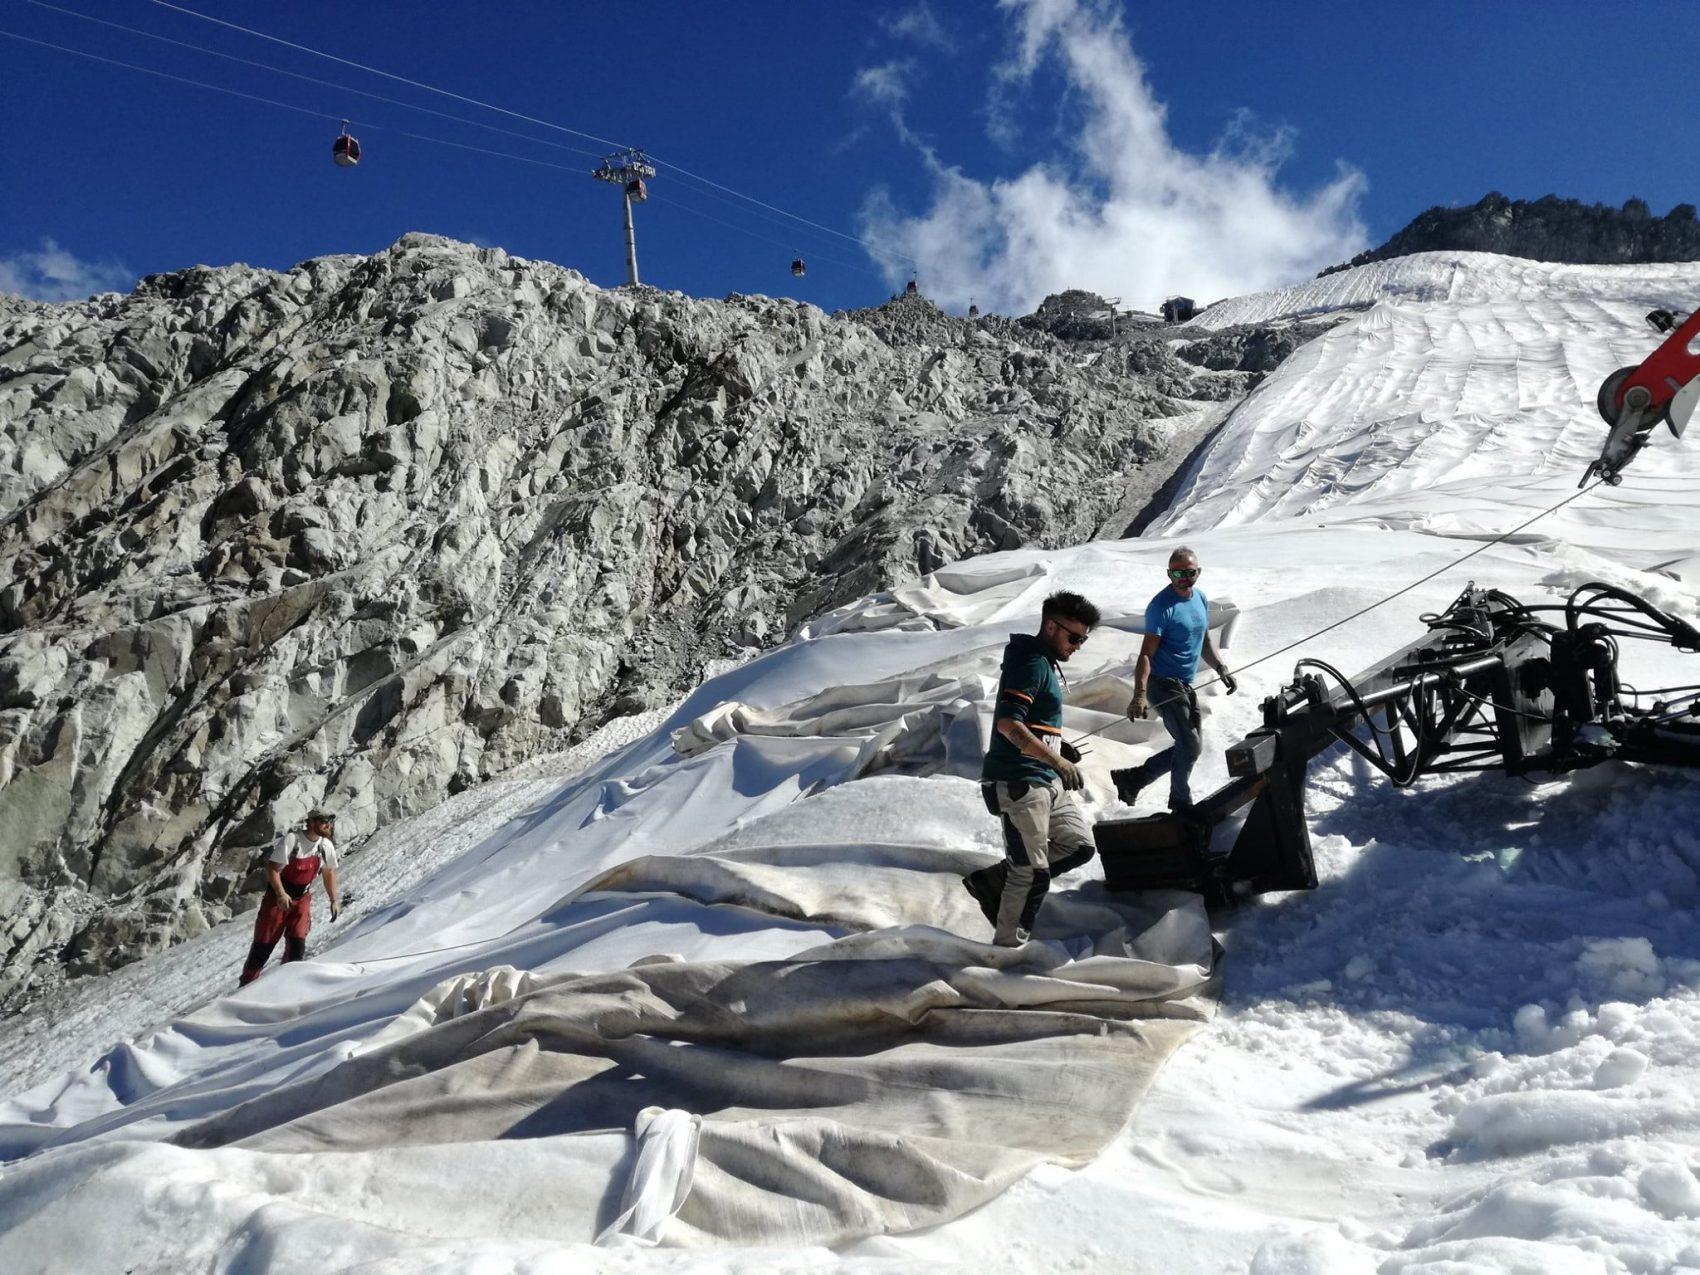 Crews work hard to save glacier